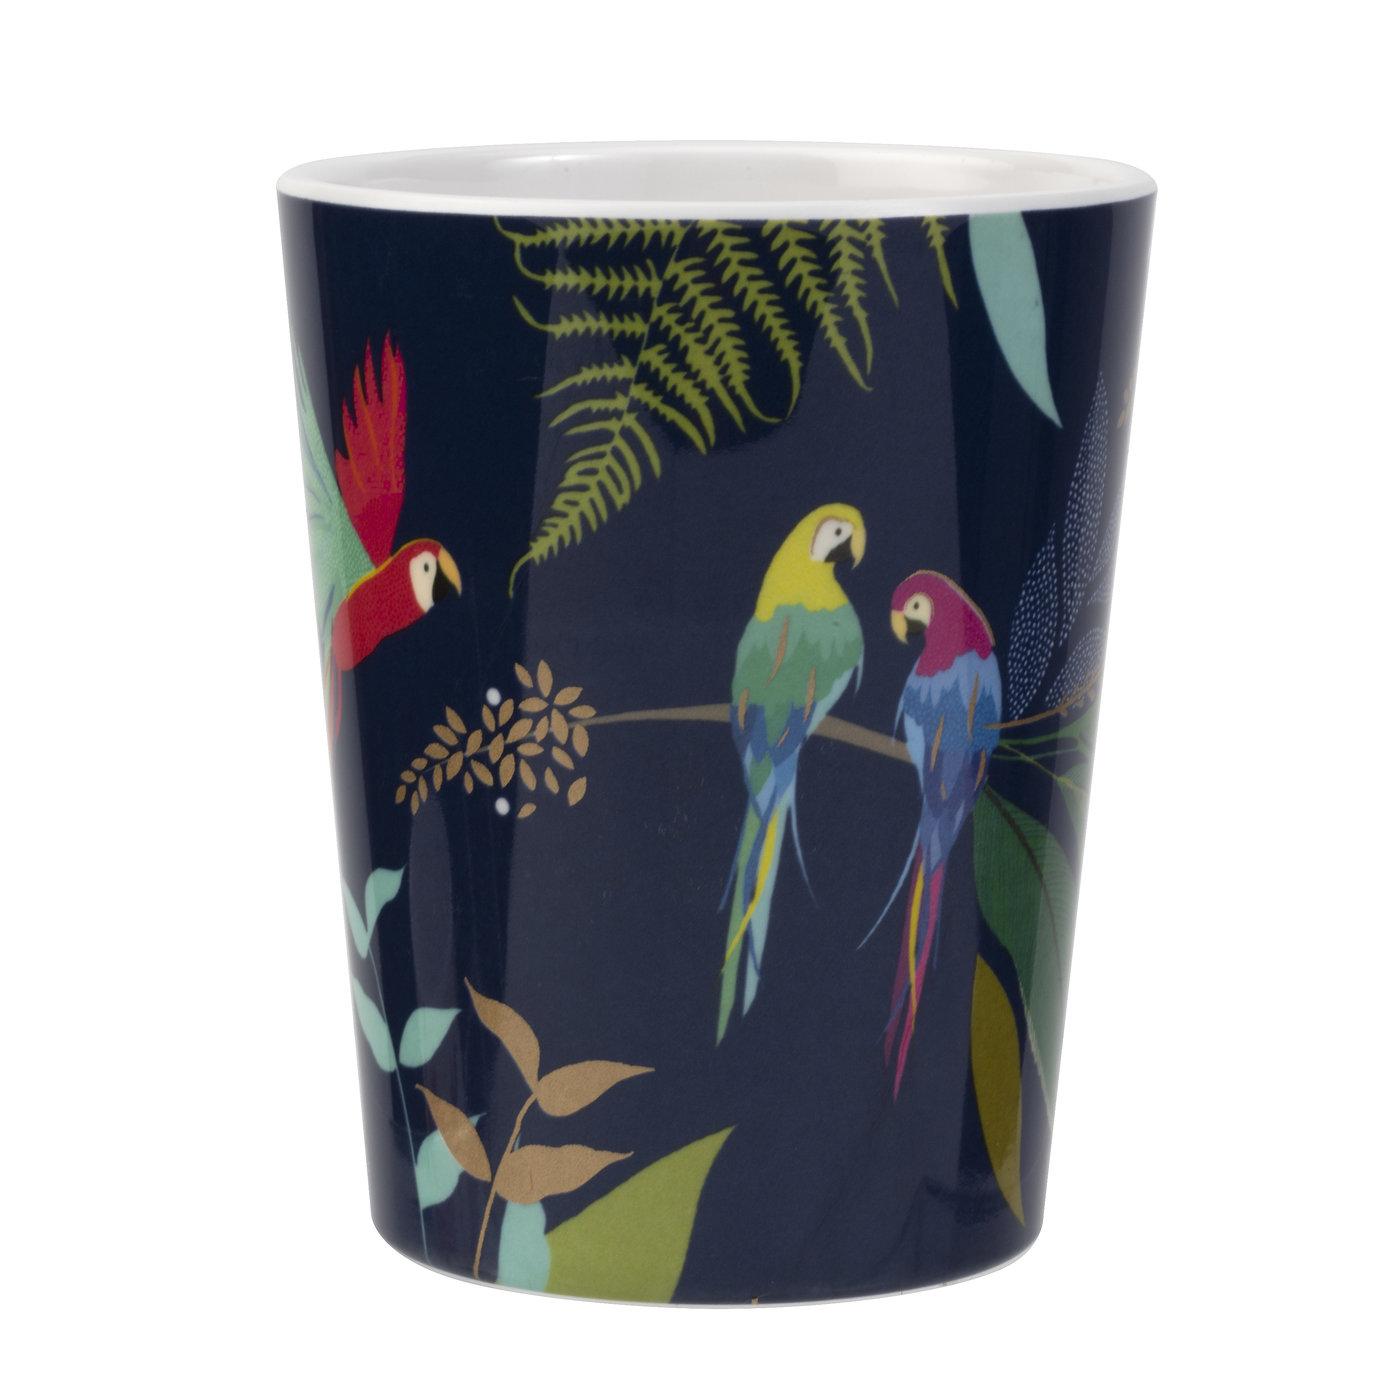 Sara Miller London Portmeirion The Parrot Melamine Cup